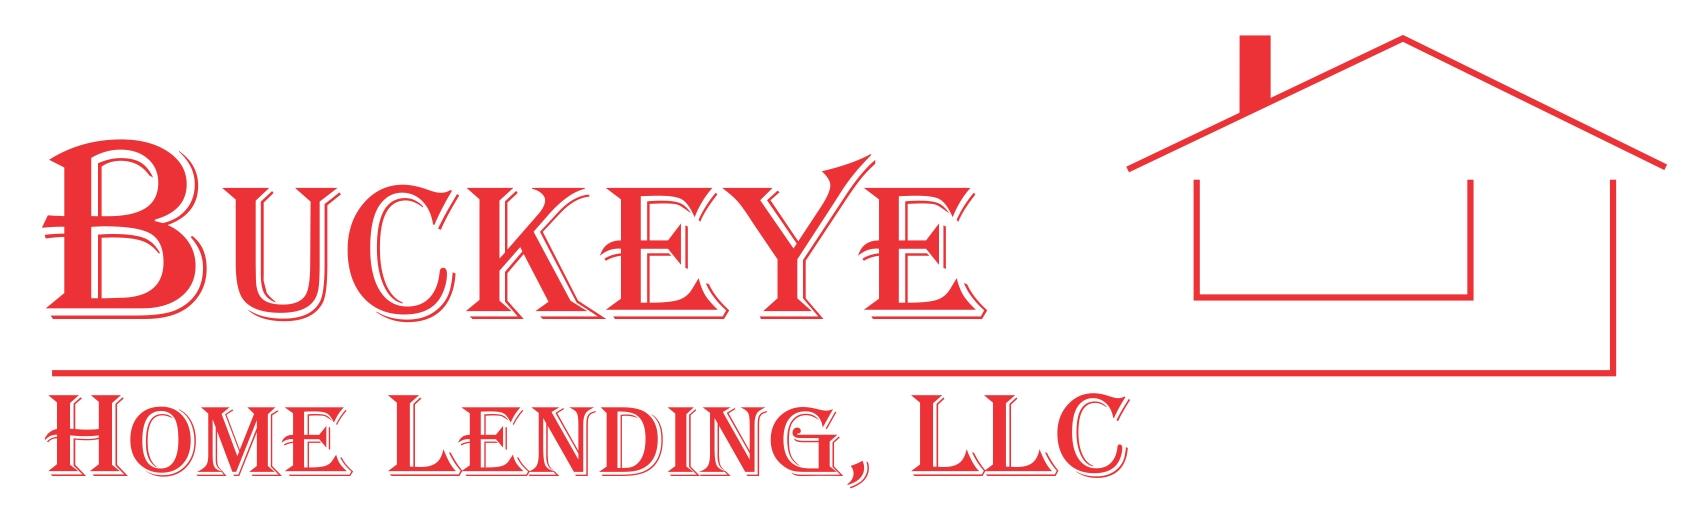 Buckeye Home Lending Logo